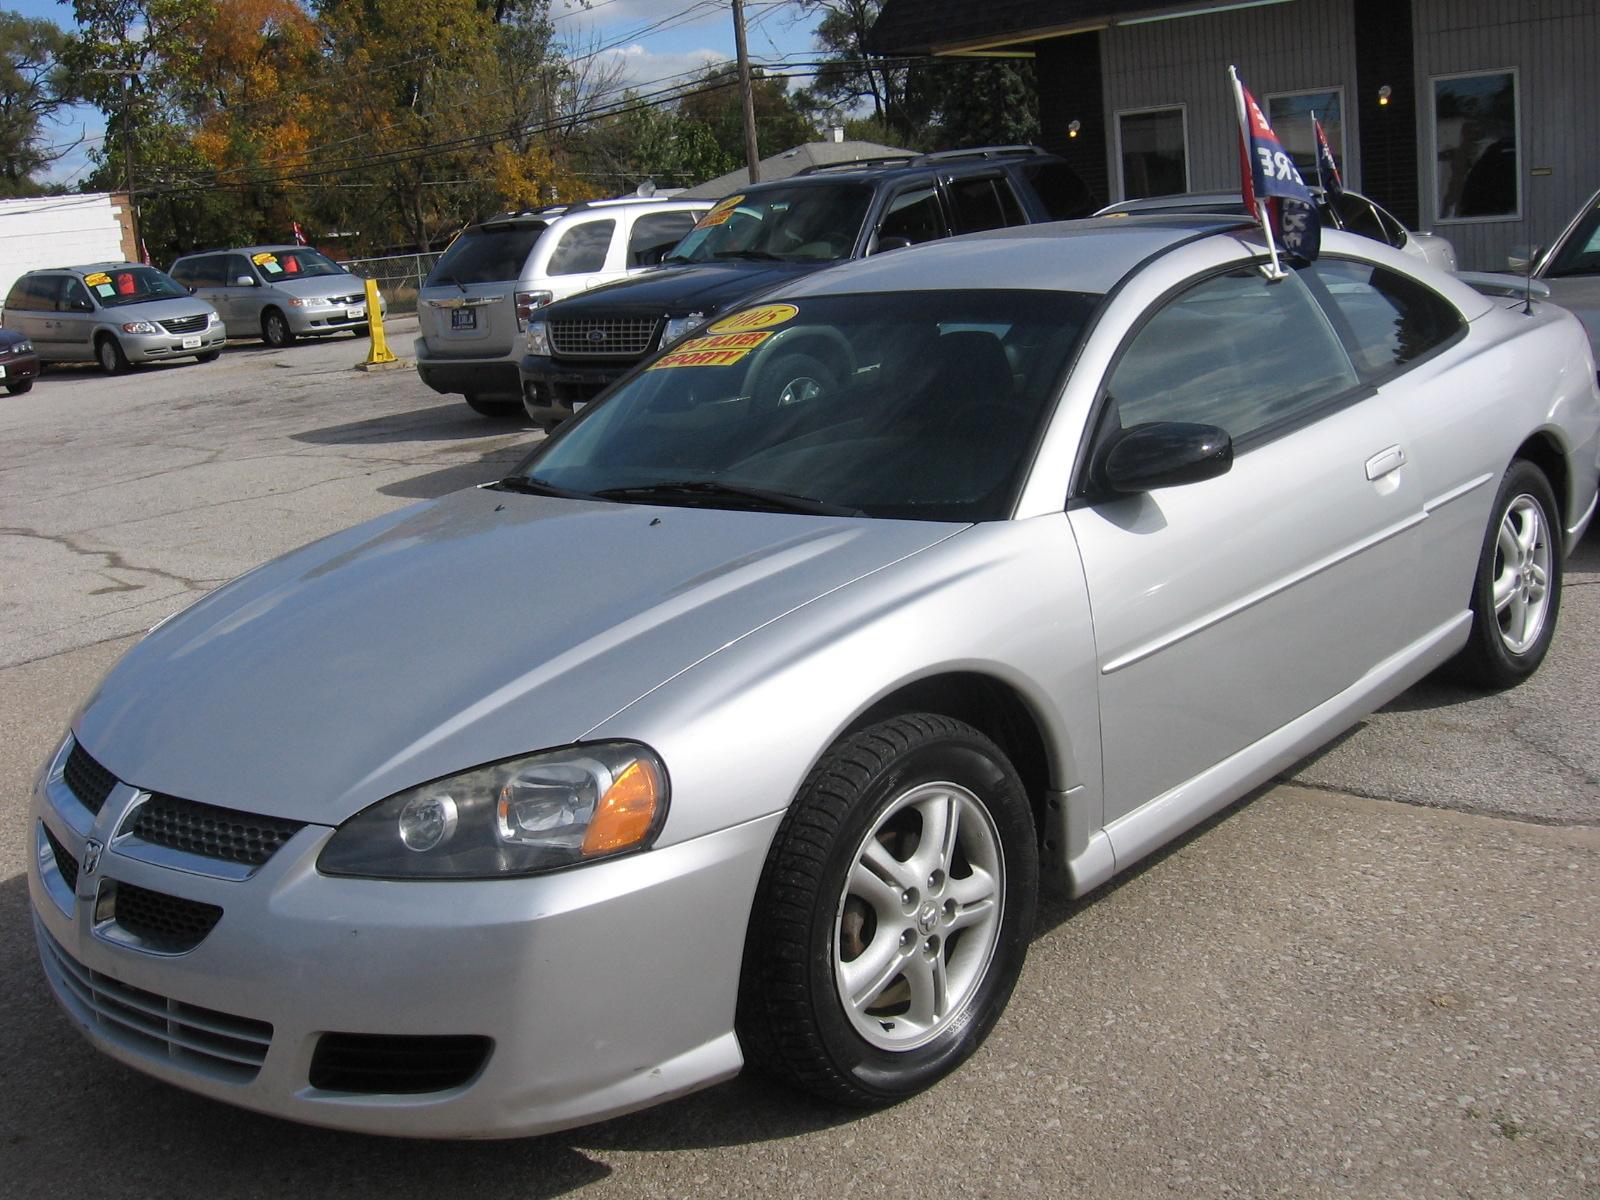 2005 Dodge Stratus BHPH Fair Market Value